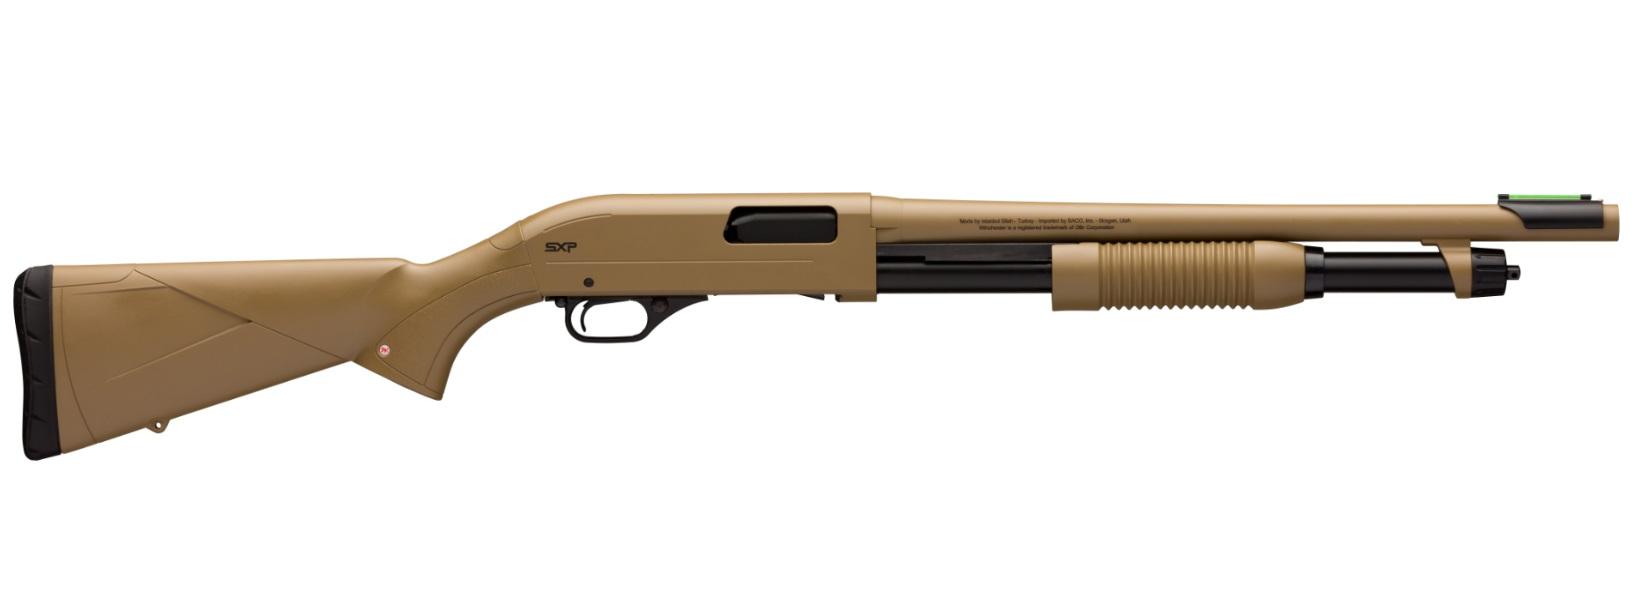 Winchester SXP Dark Earth Defender 12 Gauge